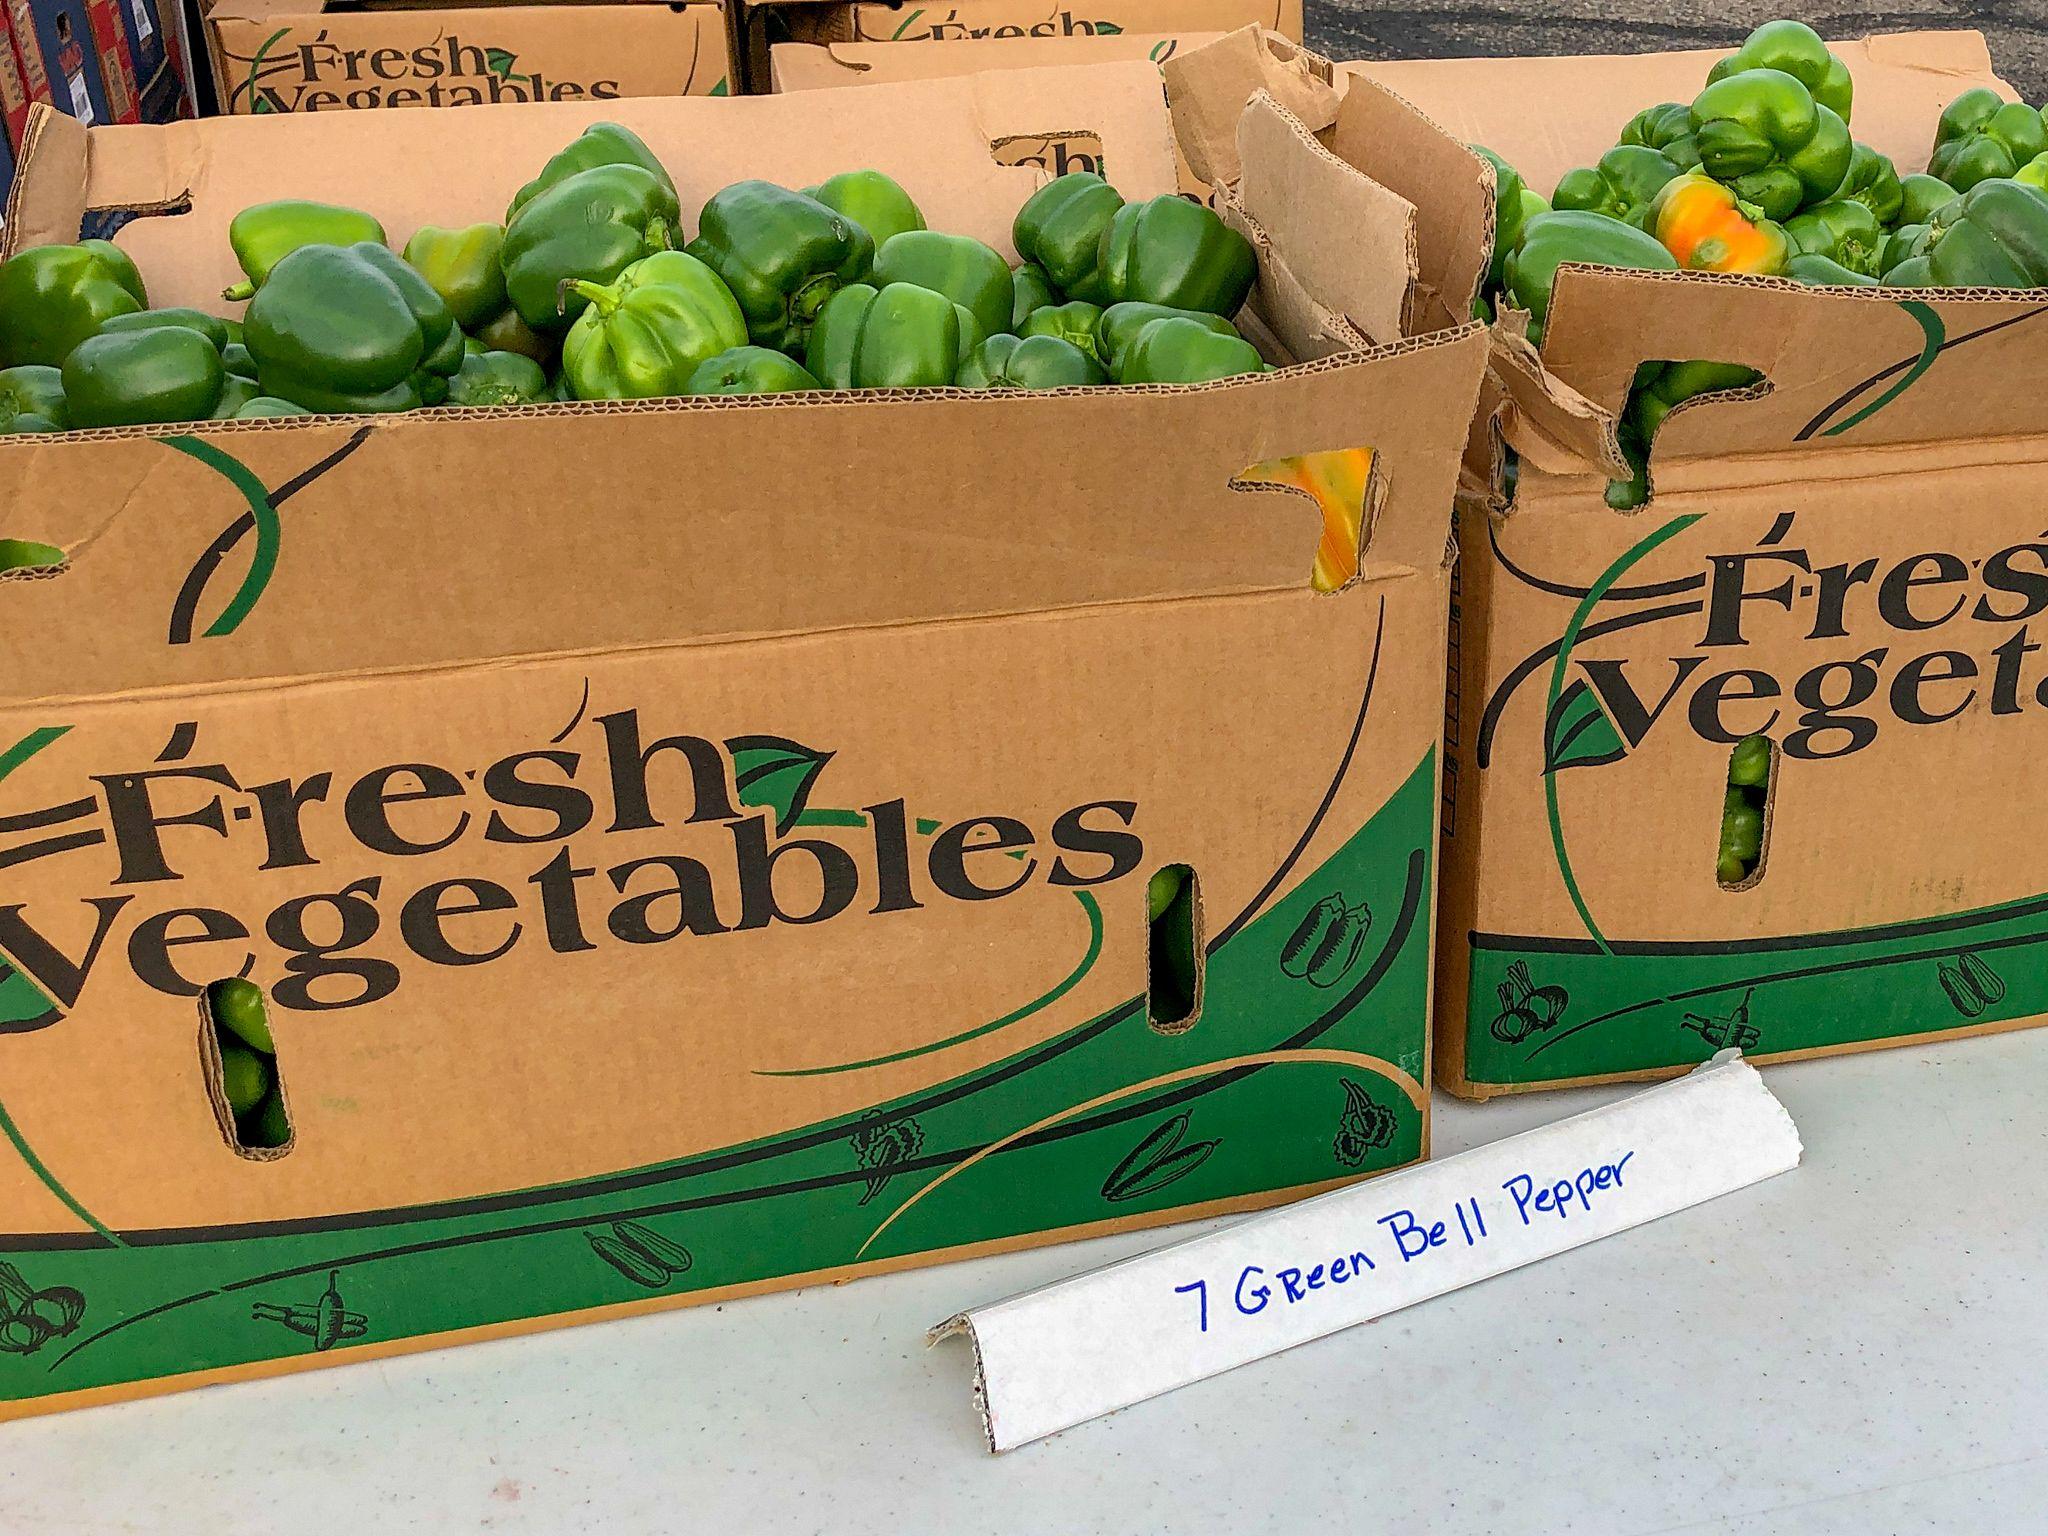 Allocated Produce